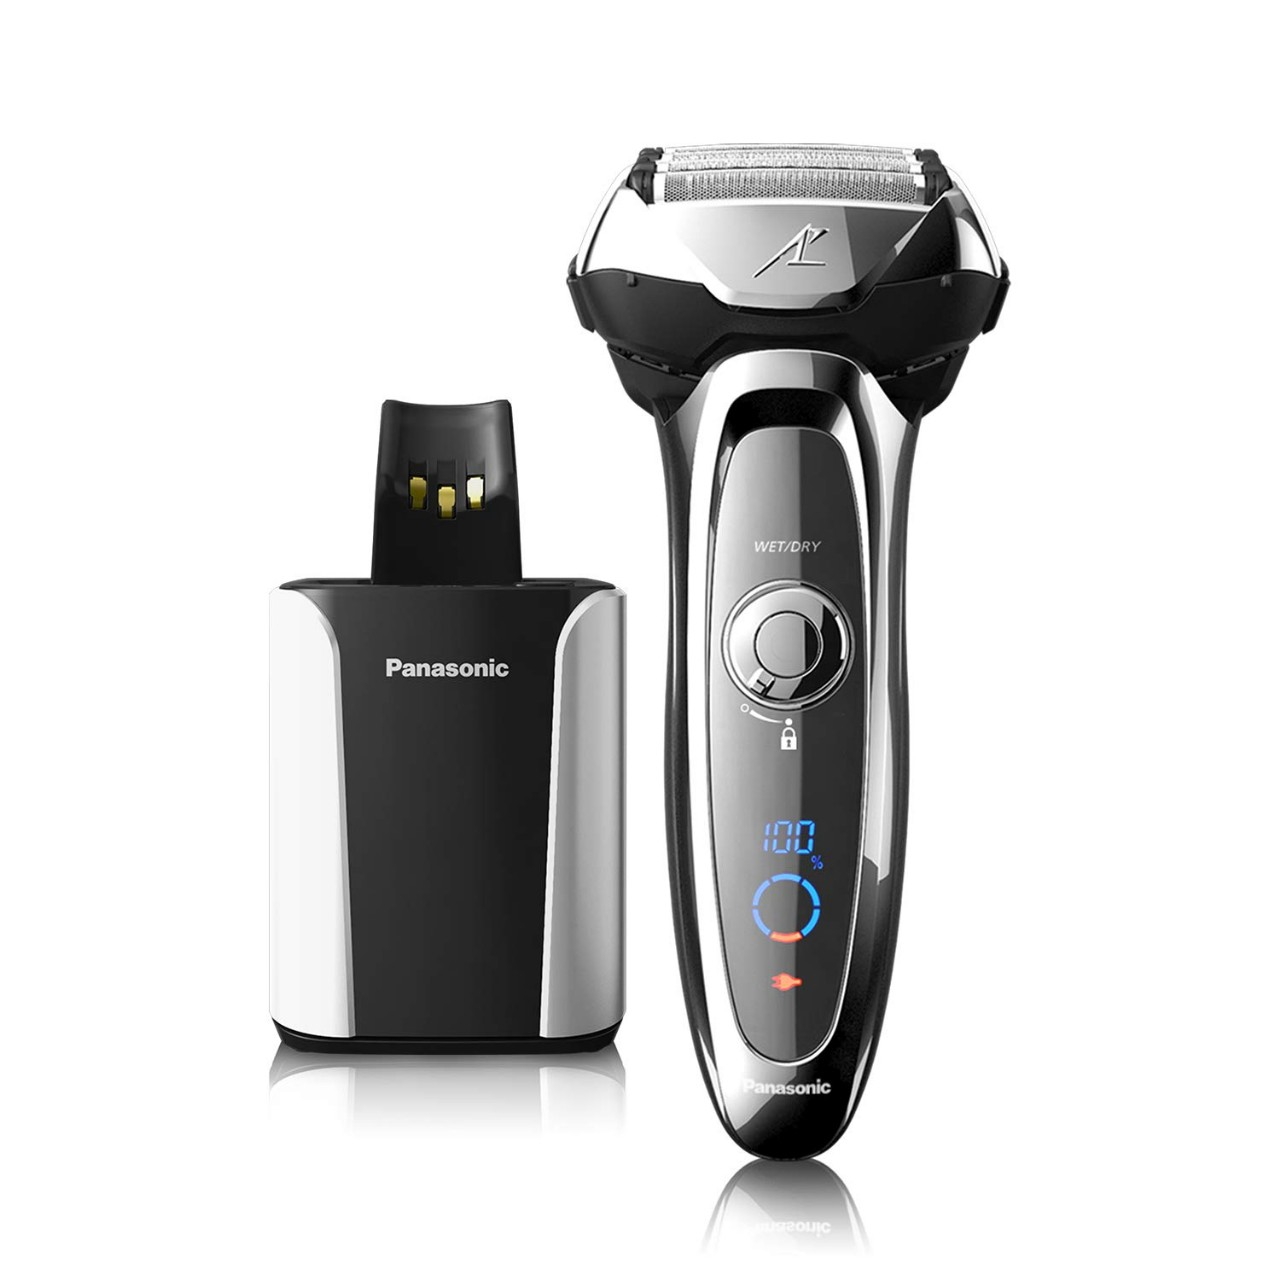 Panasonic Arc5 Electric Razor for Men, 5 Blades Shaver and Trimmer, shave sensor Technology